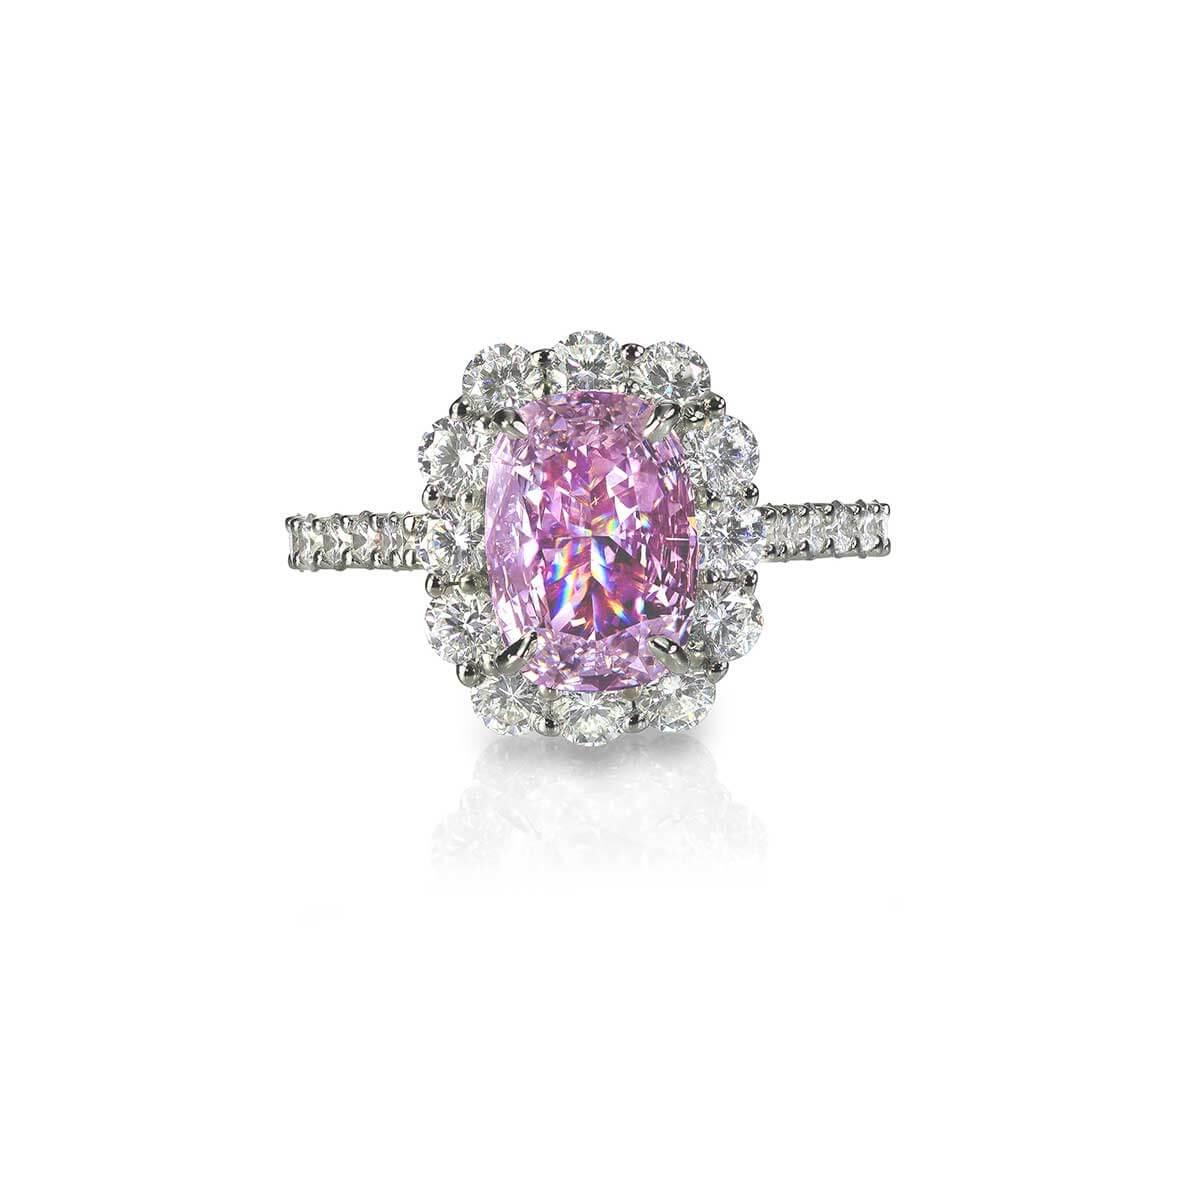 Serenity Pink Diamond Ring